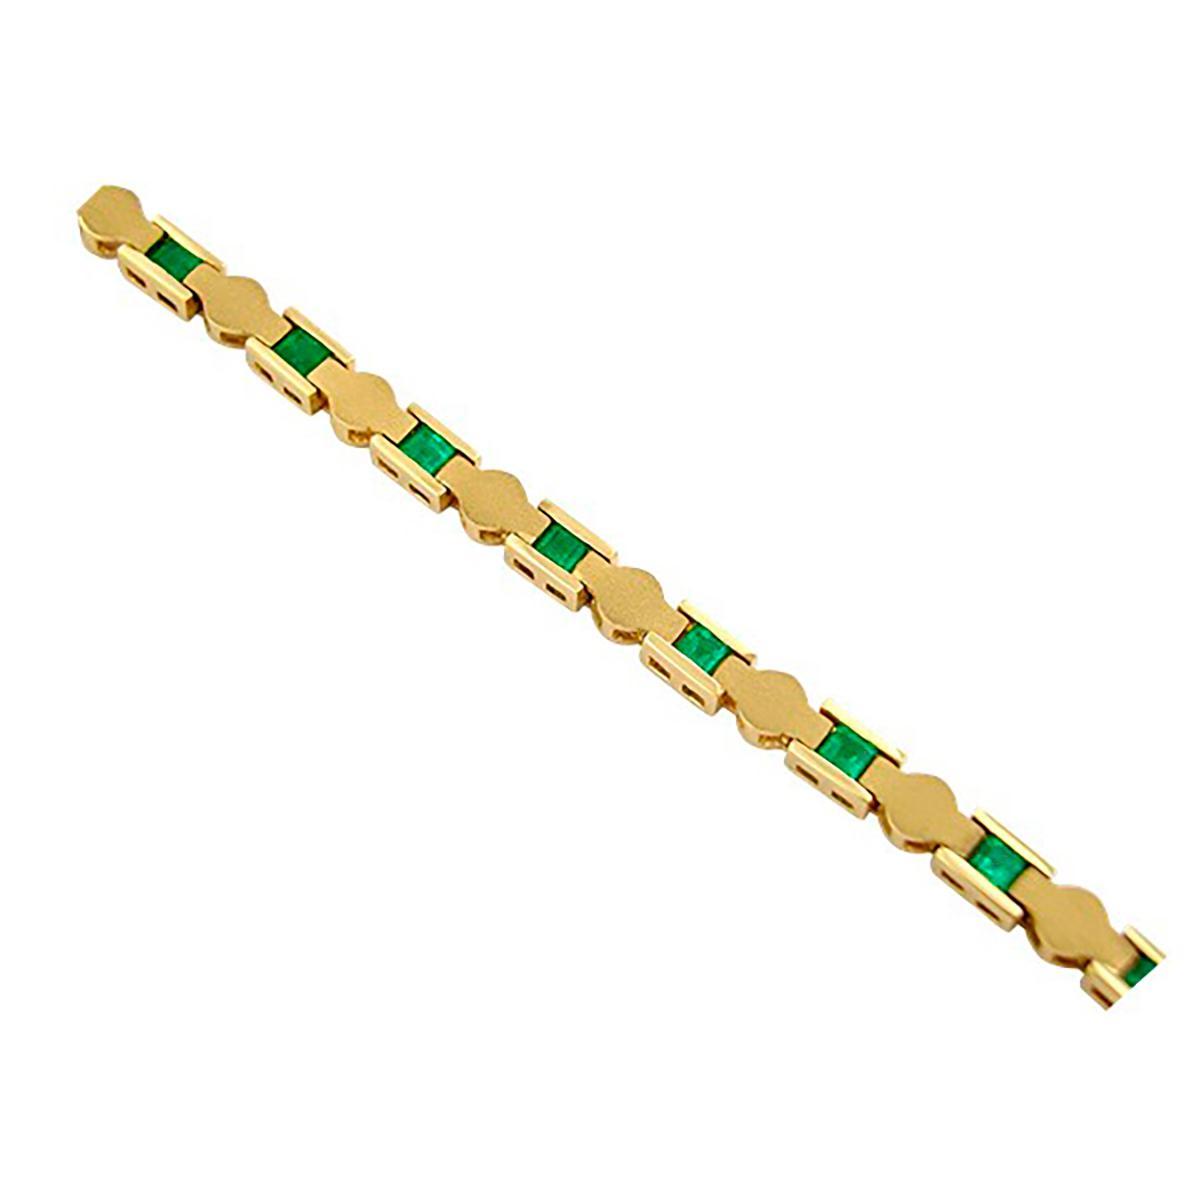 emerald-bracelet-in-18k-yellow-gold-in-fine-sandblast-finished-